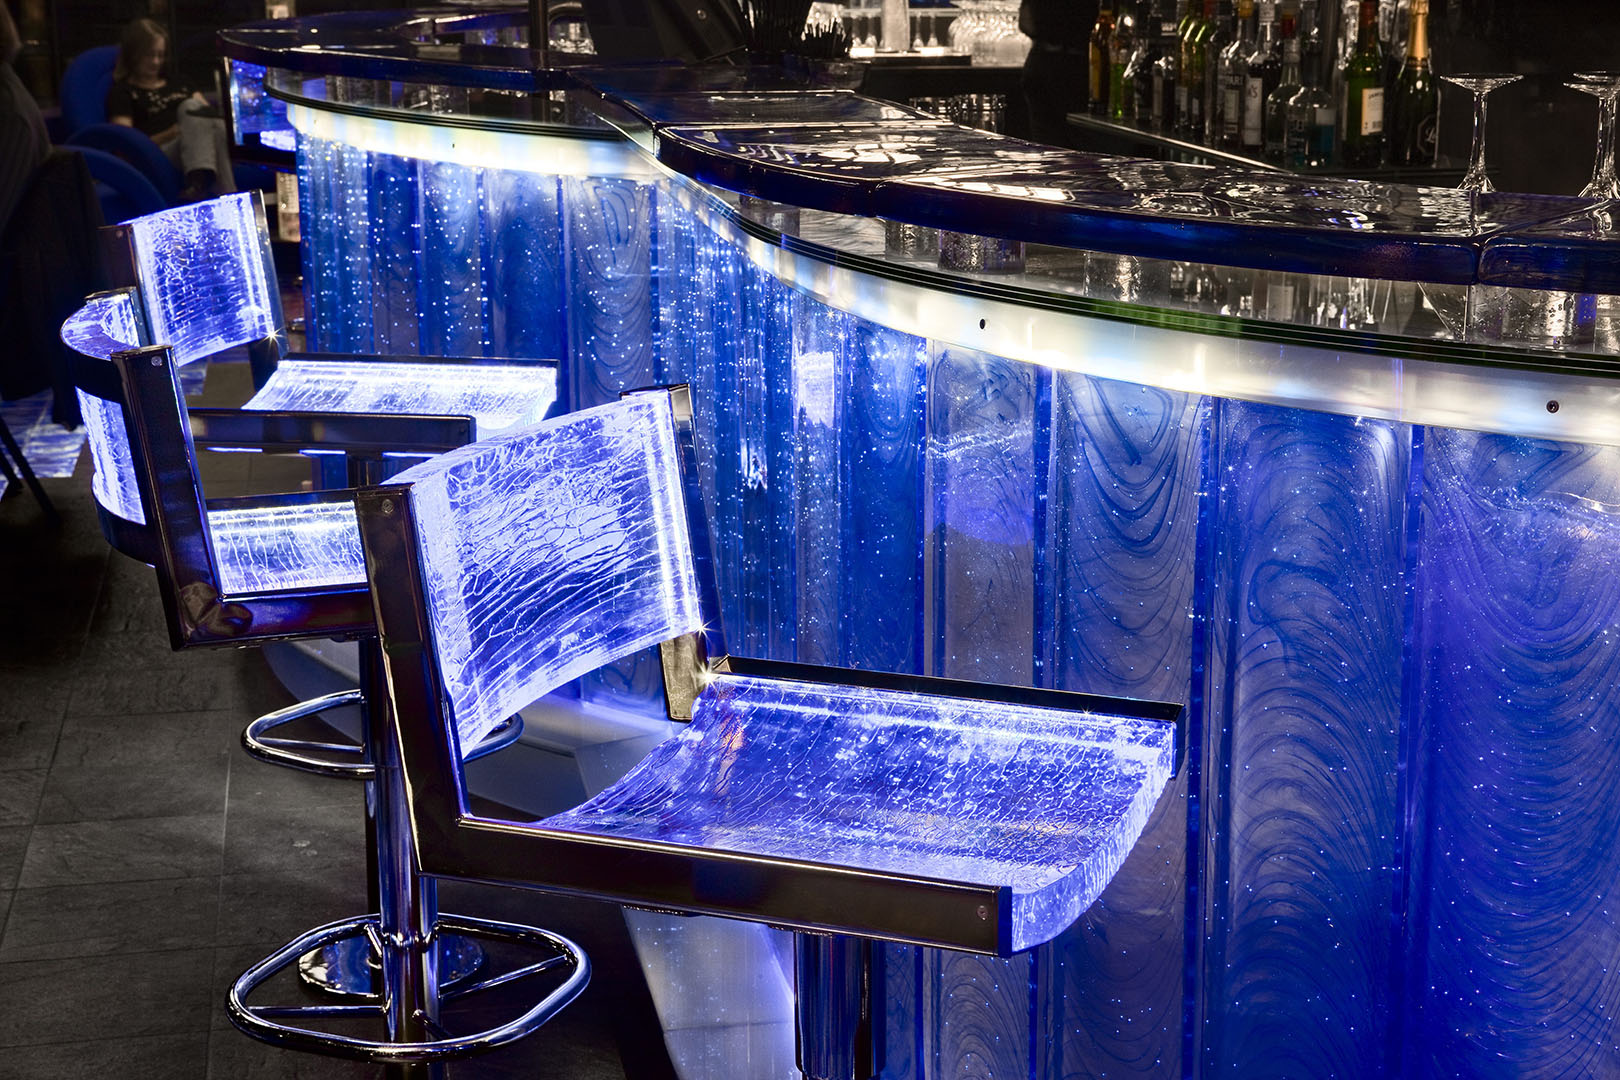 The 3.5-tonne cobalt-blue bar at Kosta Boda Art Hotel.